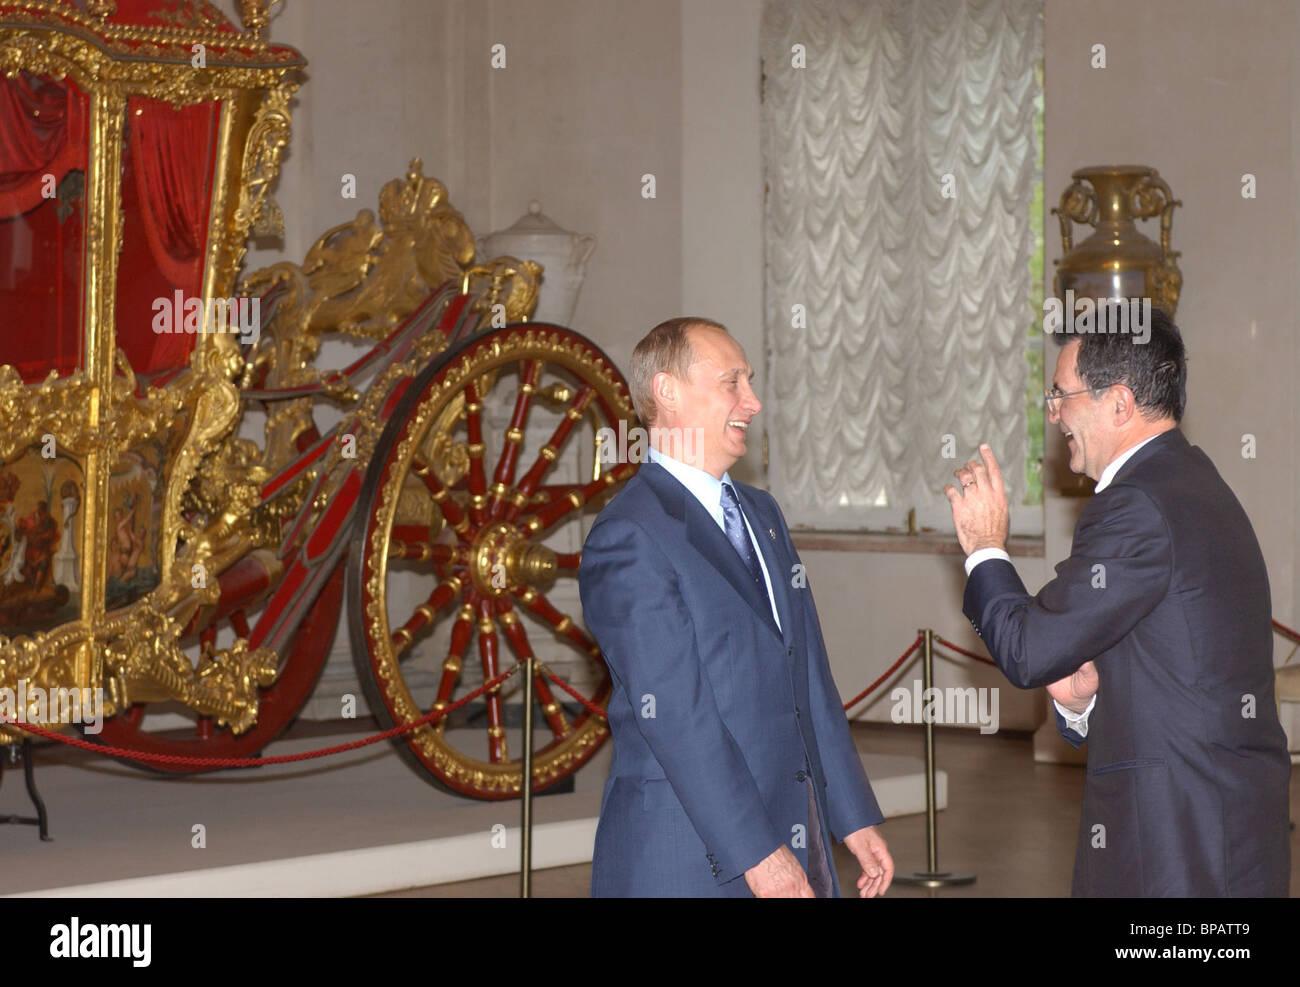 Putin, world leaders visit Hermitage - Stock Image